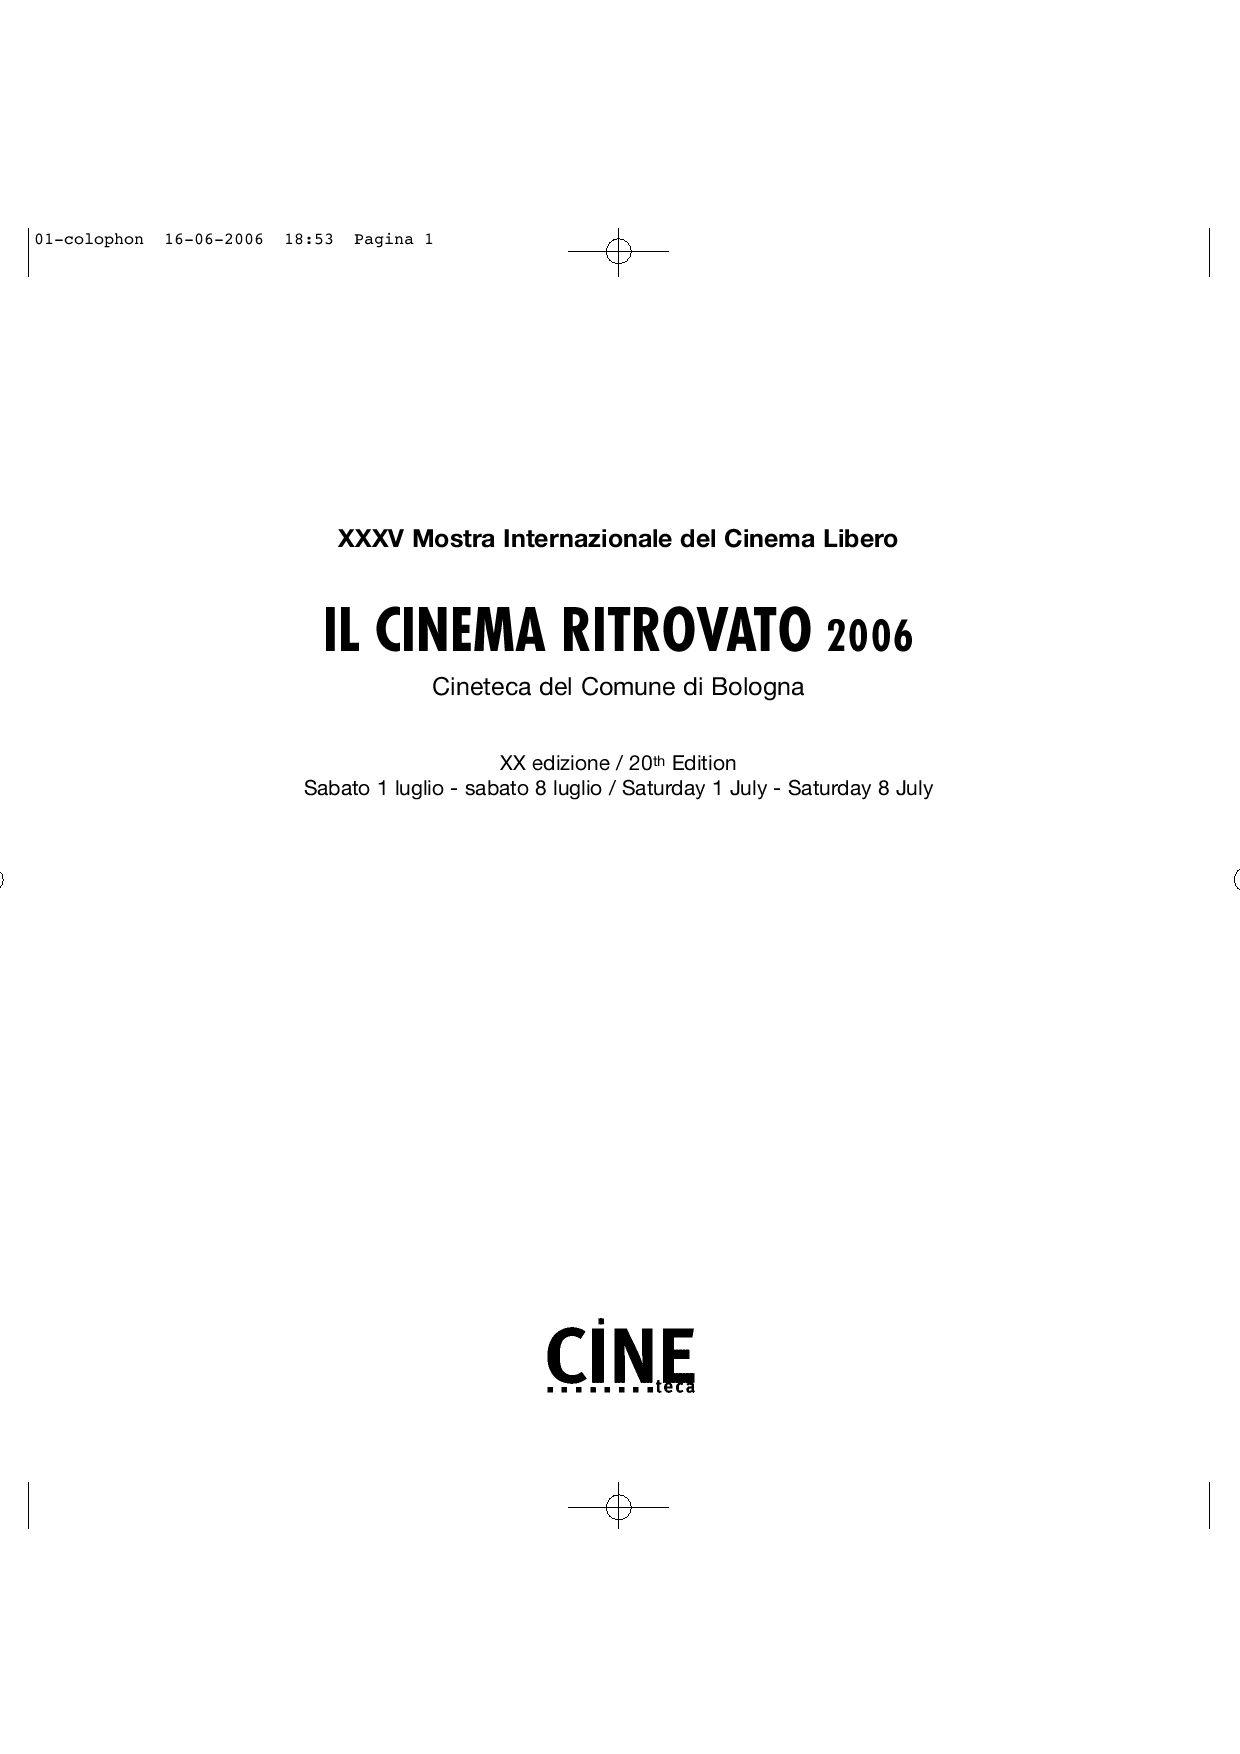 Catologo Il Cinema Ritrovato 2008 By Cineteca Di Bologna Tcash Vaganza 35 Dialogue Baby Giftset Polka Series 05 Issuu